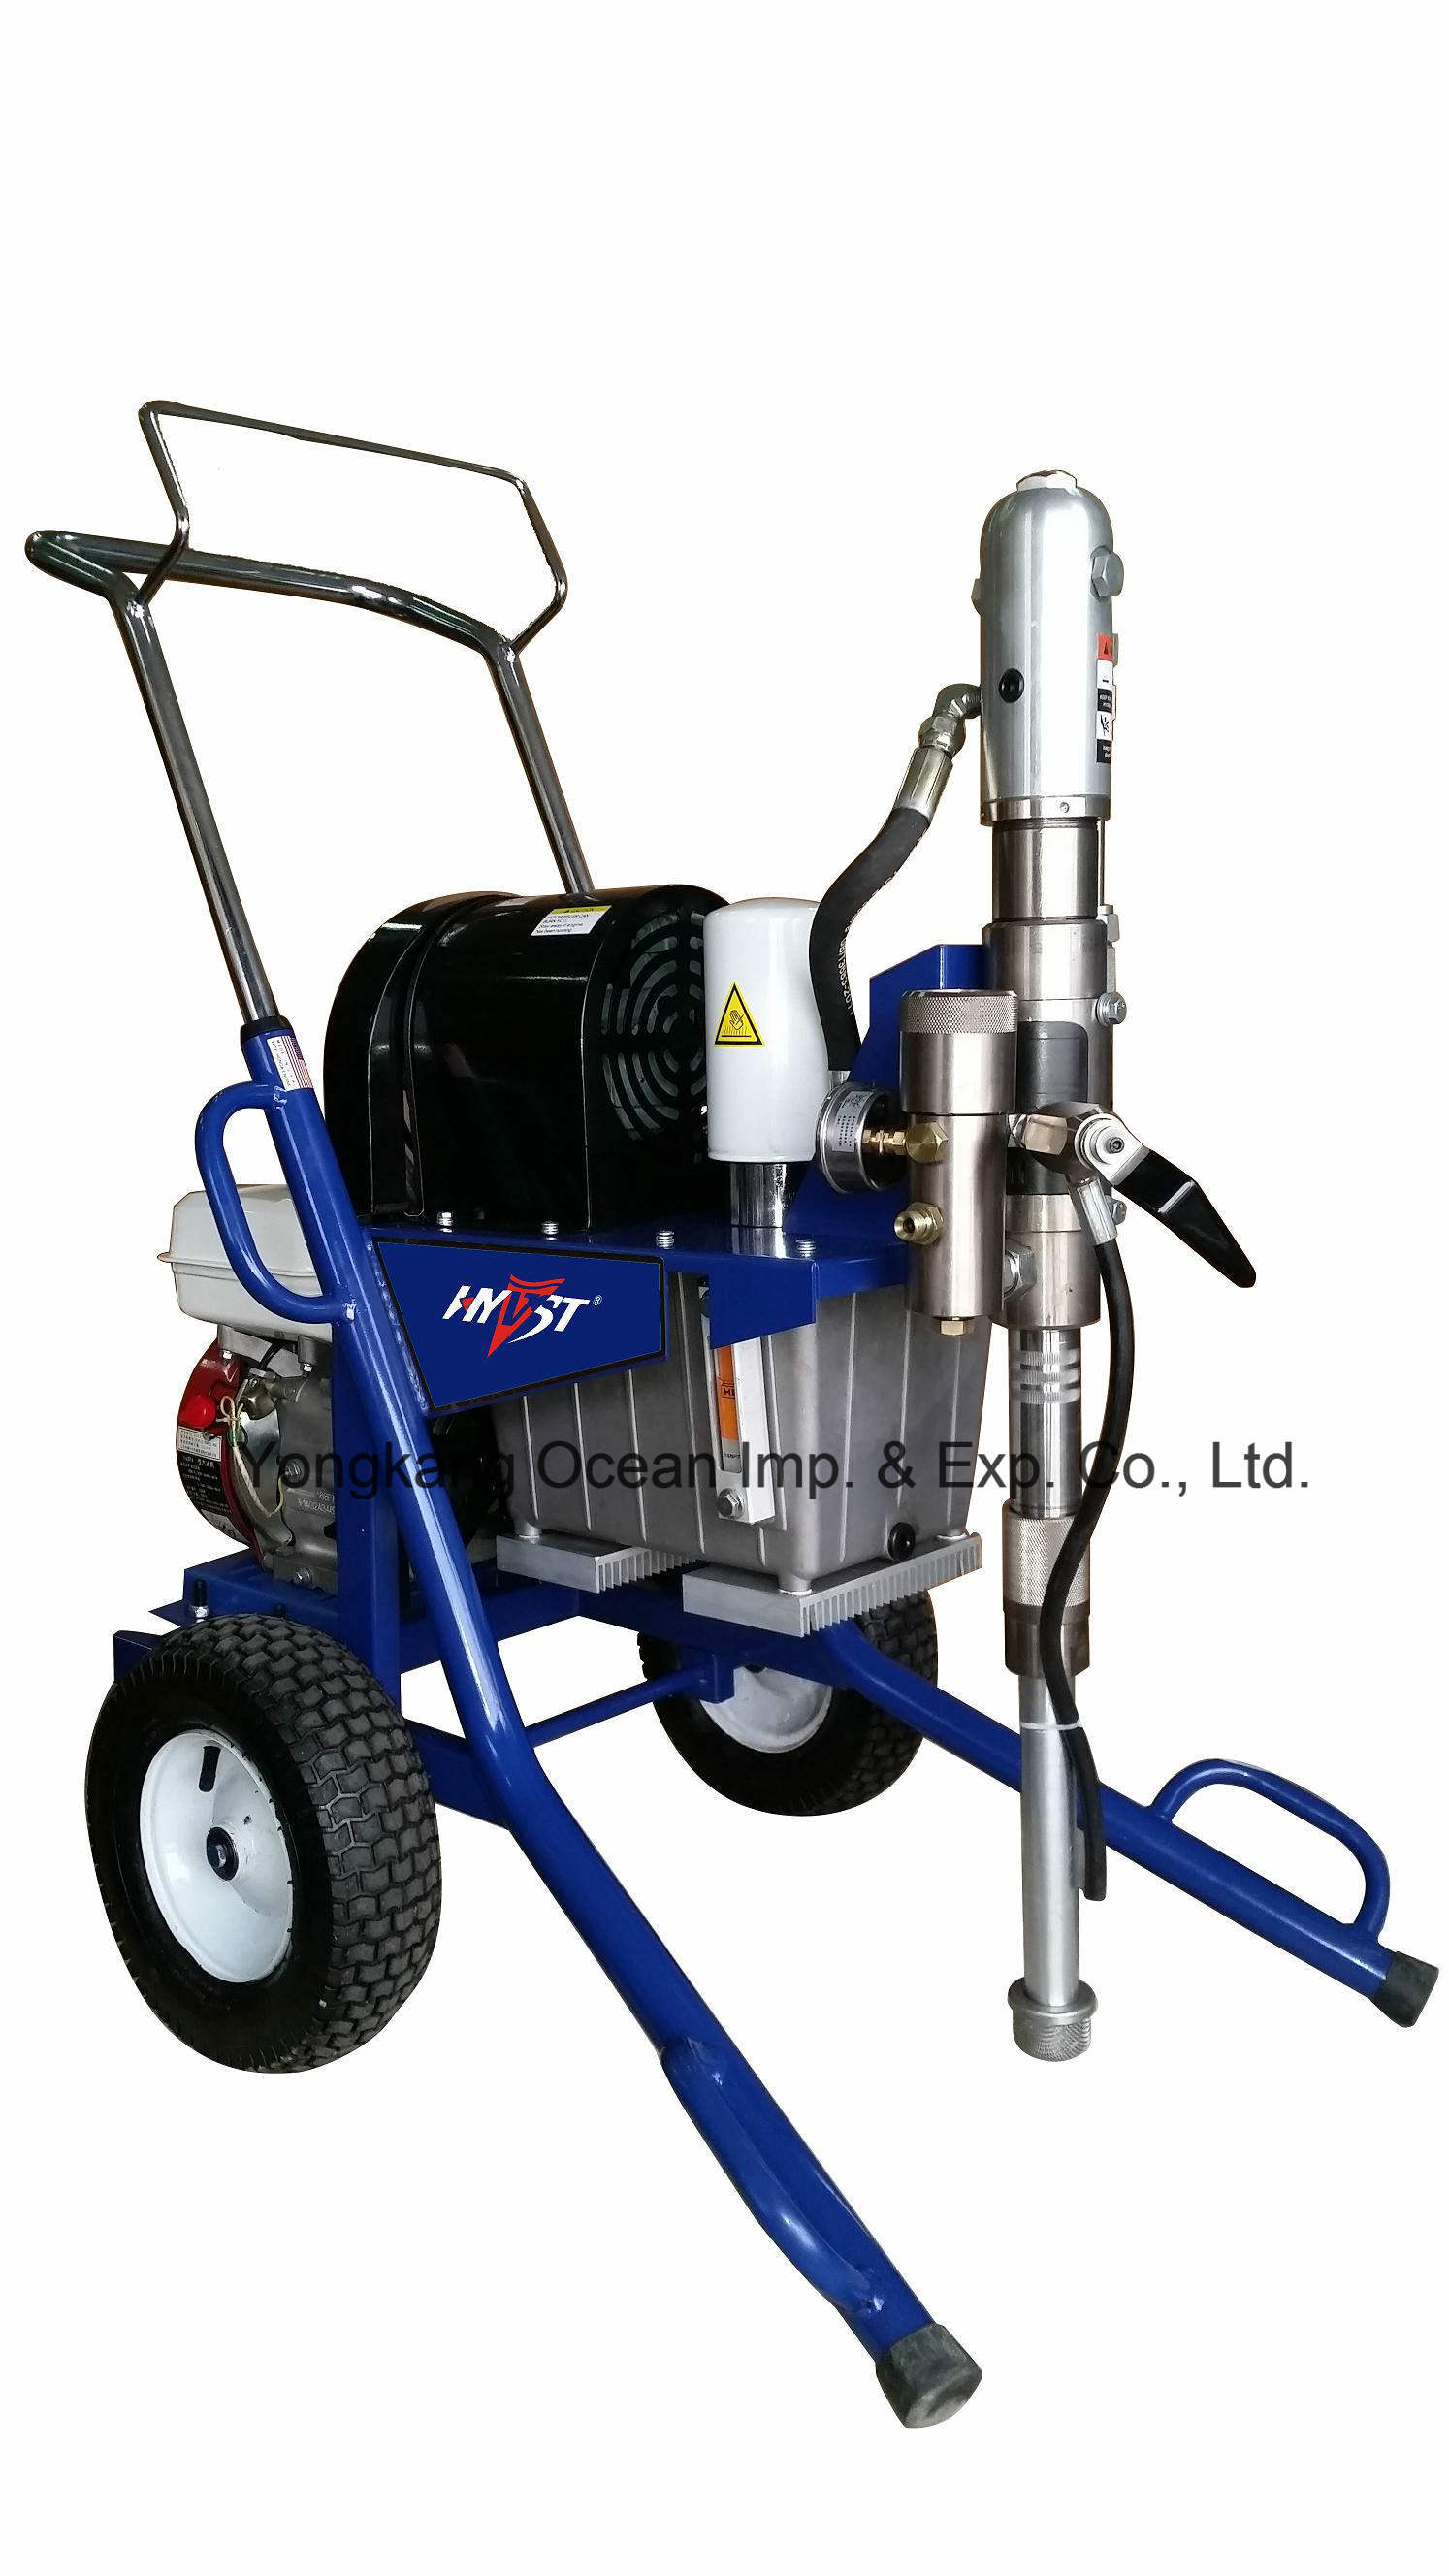 Hyvst Electric High Pressure Airless Paint Sprayer Spt8500